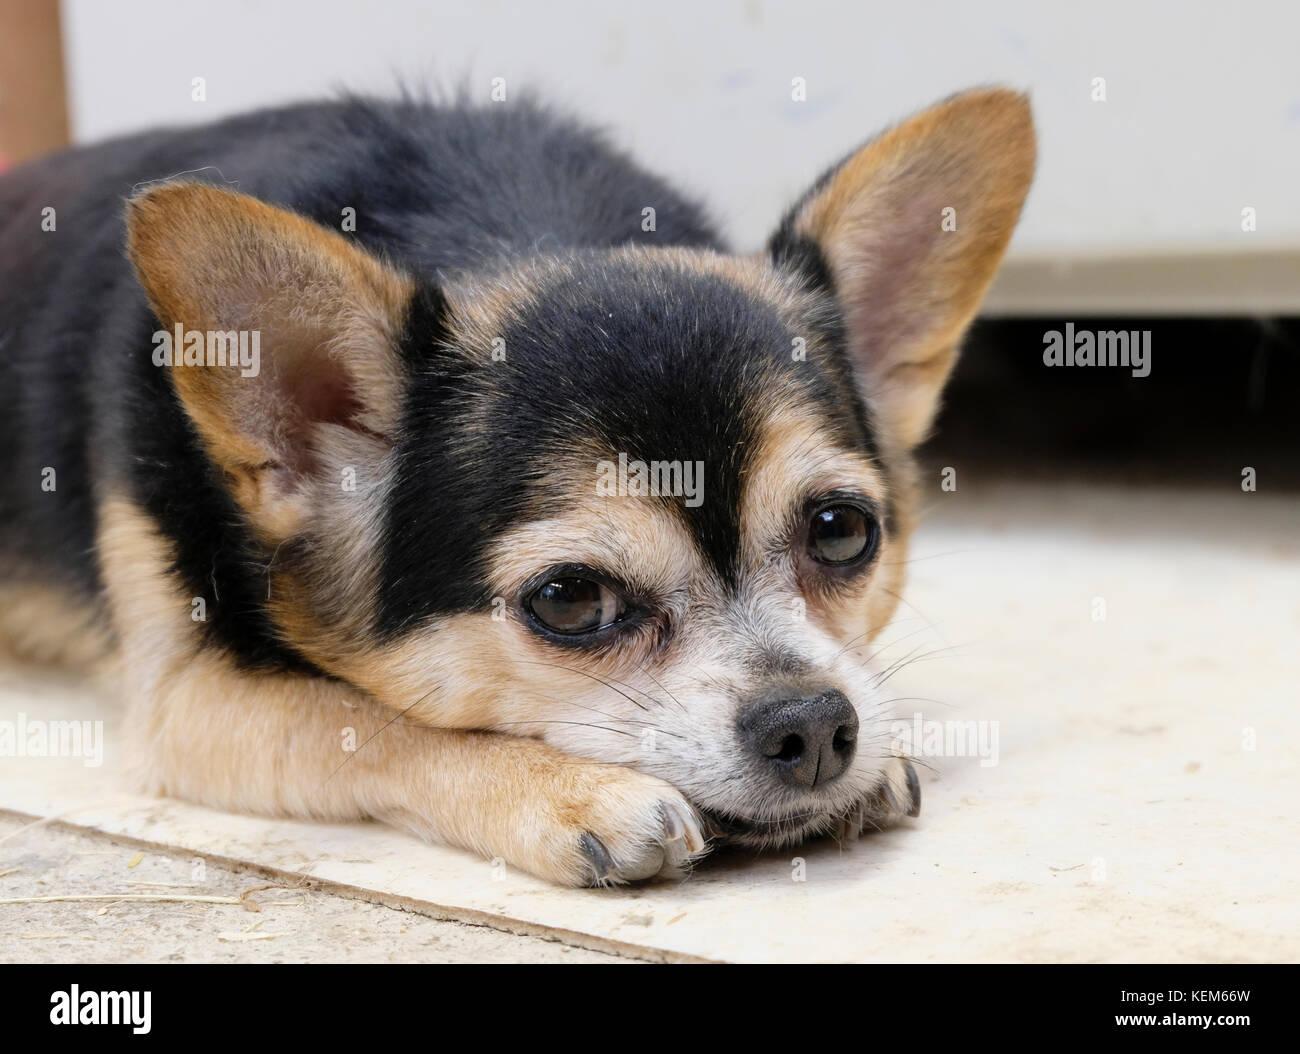 Elderly female Chihuahua dog lying down facing camera - Stock Image